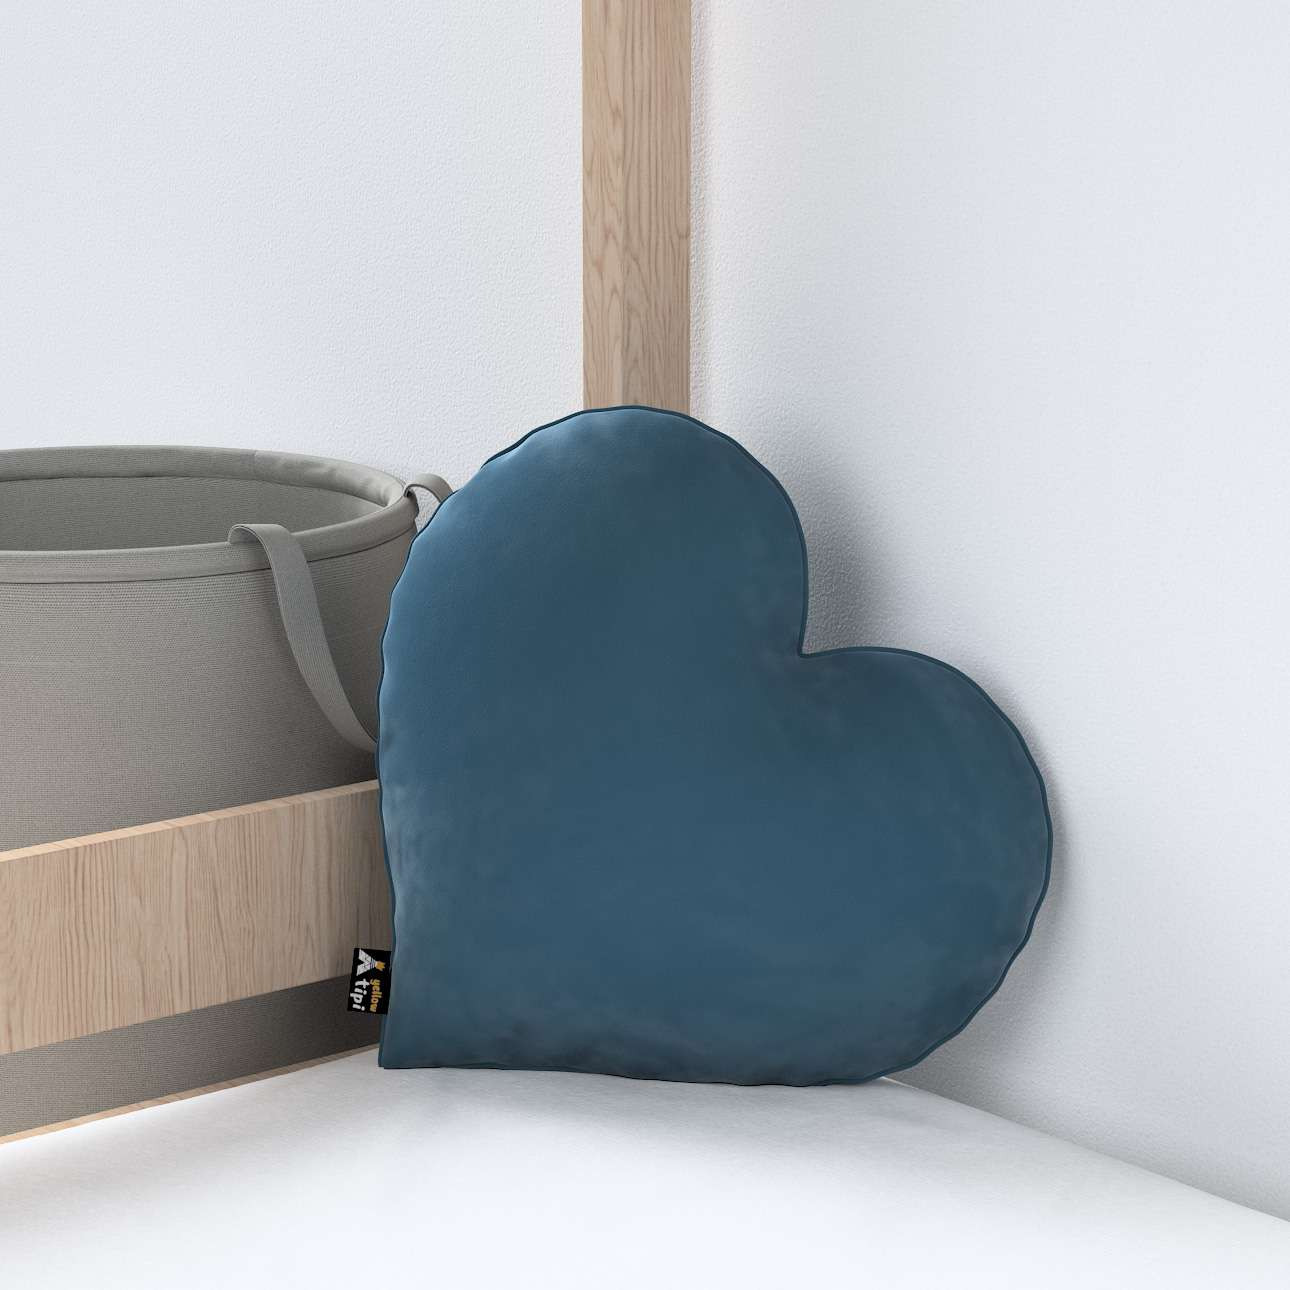 Heart of Love pagalvėlė kolekcijoje Posh Velvet, audinys: 704-16